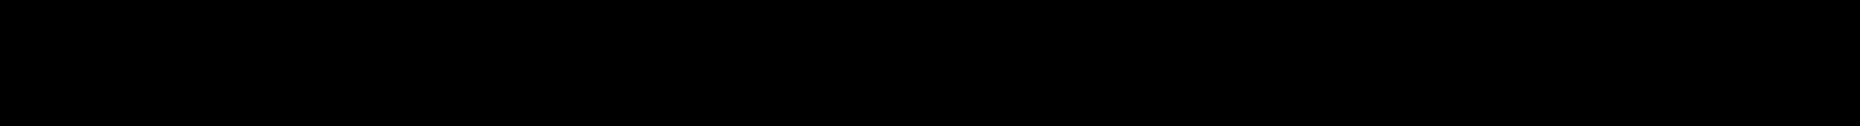 Brrun & Hjejle logo